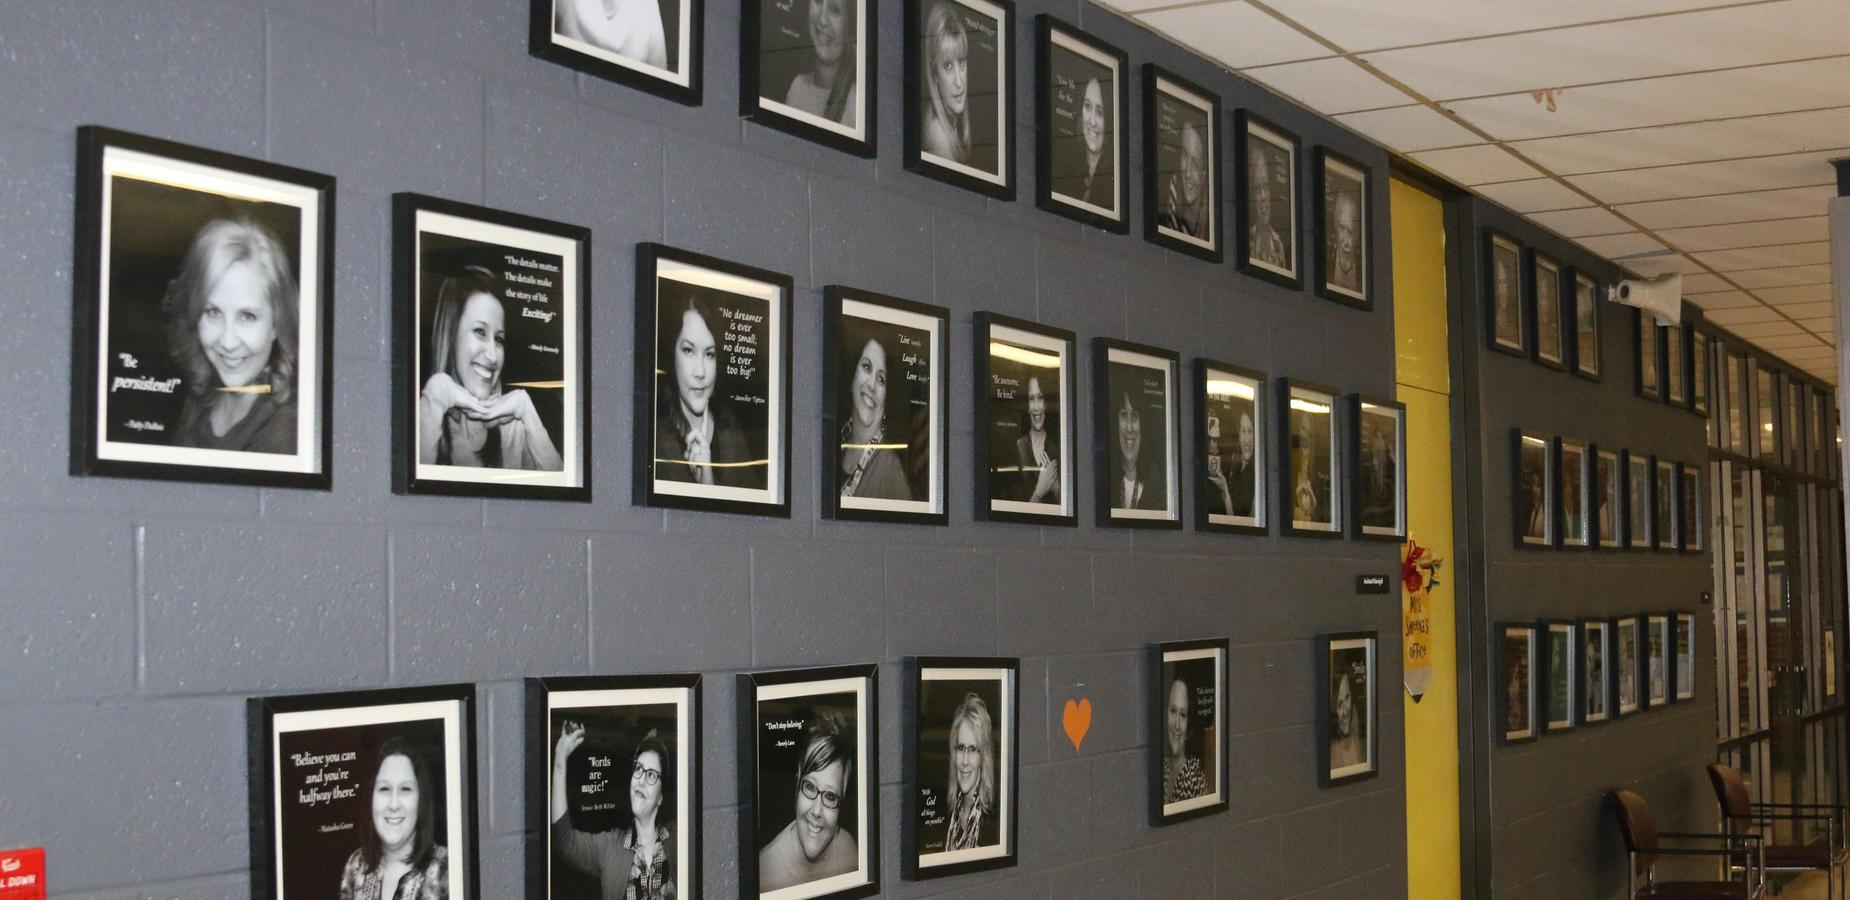 Faculty pics